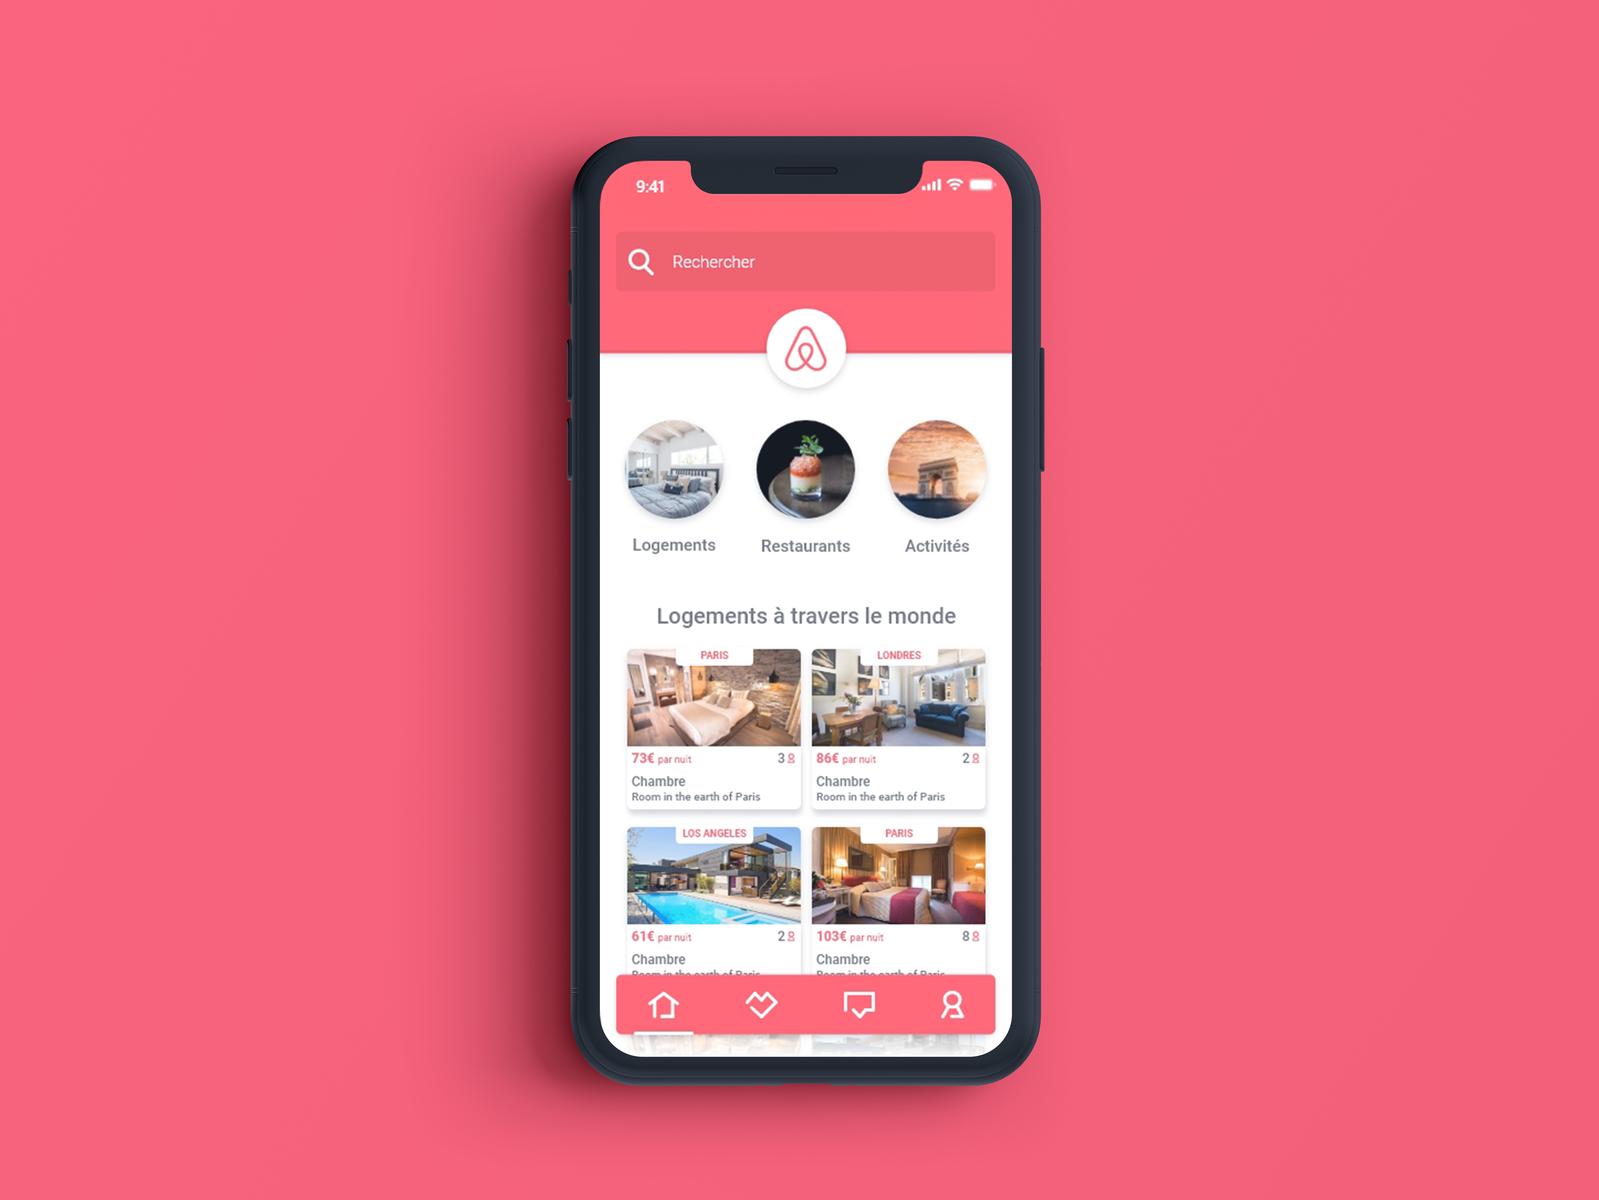 Ui Ux Design For Airbnb App By Cyprien Mellet Dribbble Dribbble